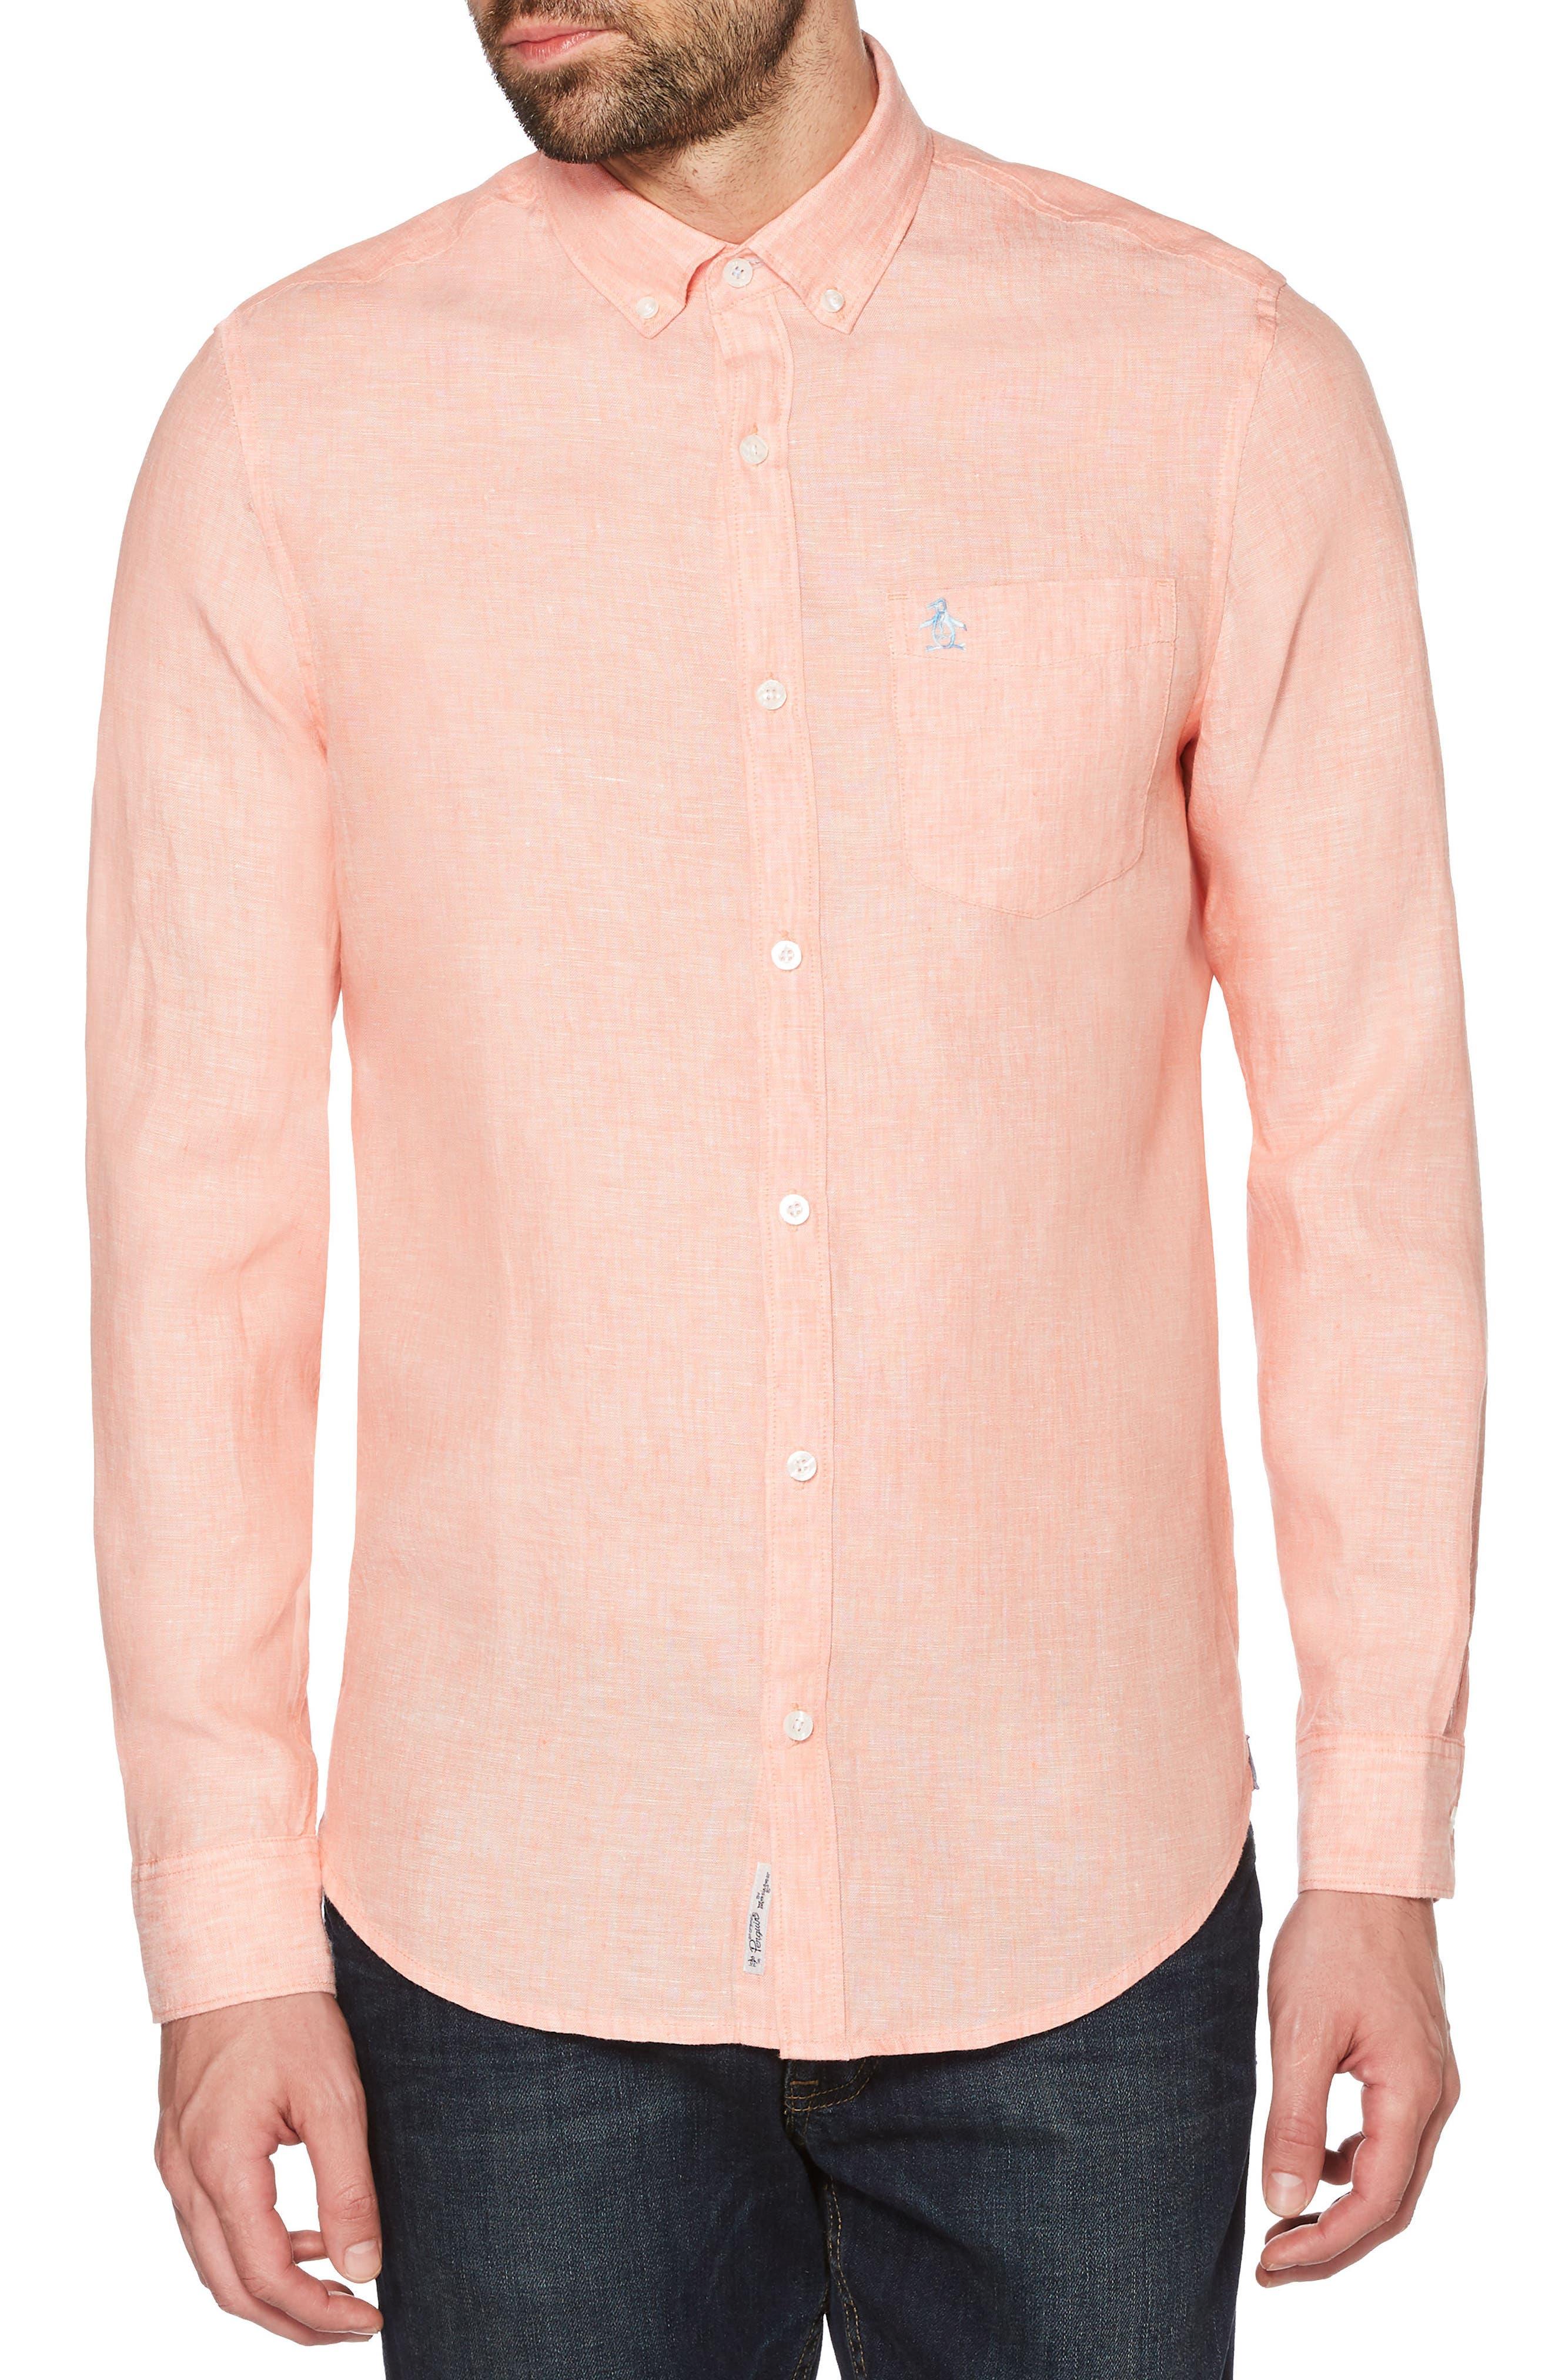 Nep Woven Shirt,                             Main thumbnail 1, color,                             PEACH AMBER